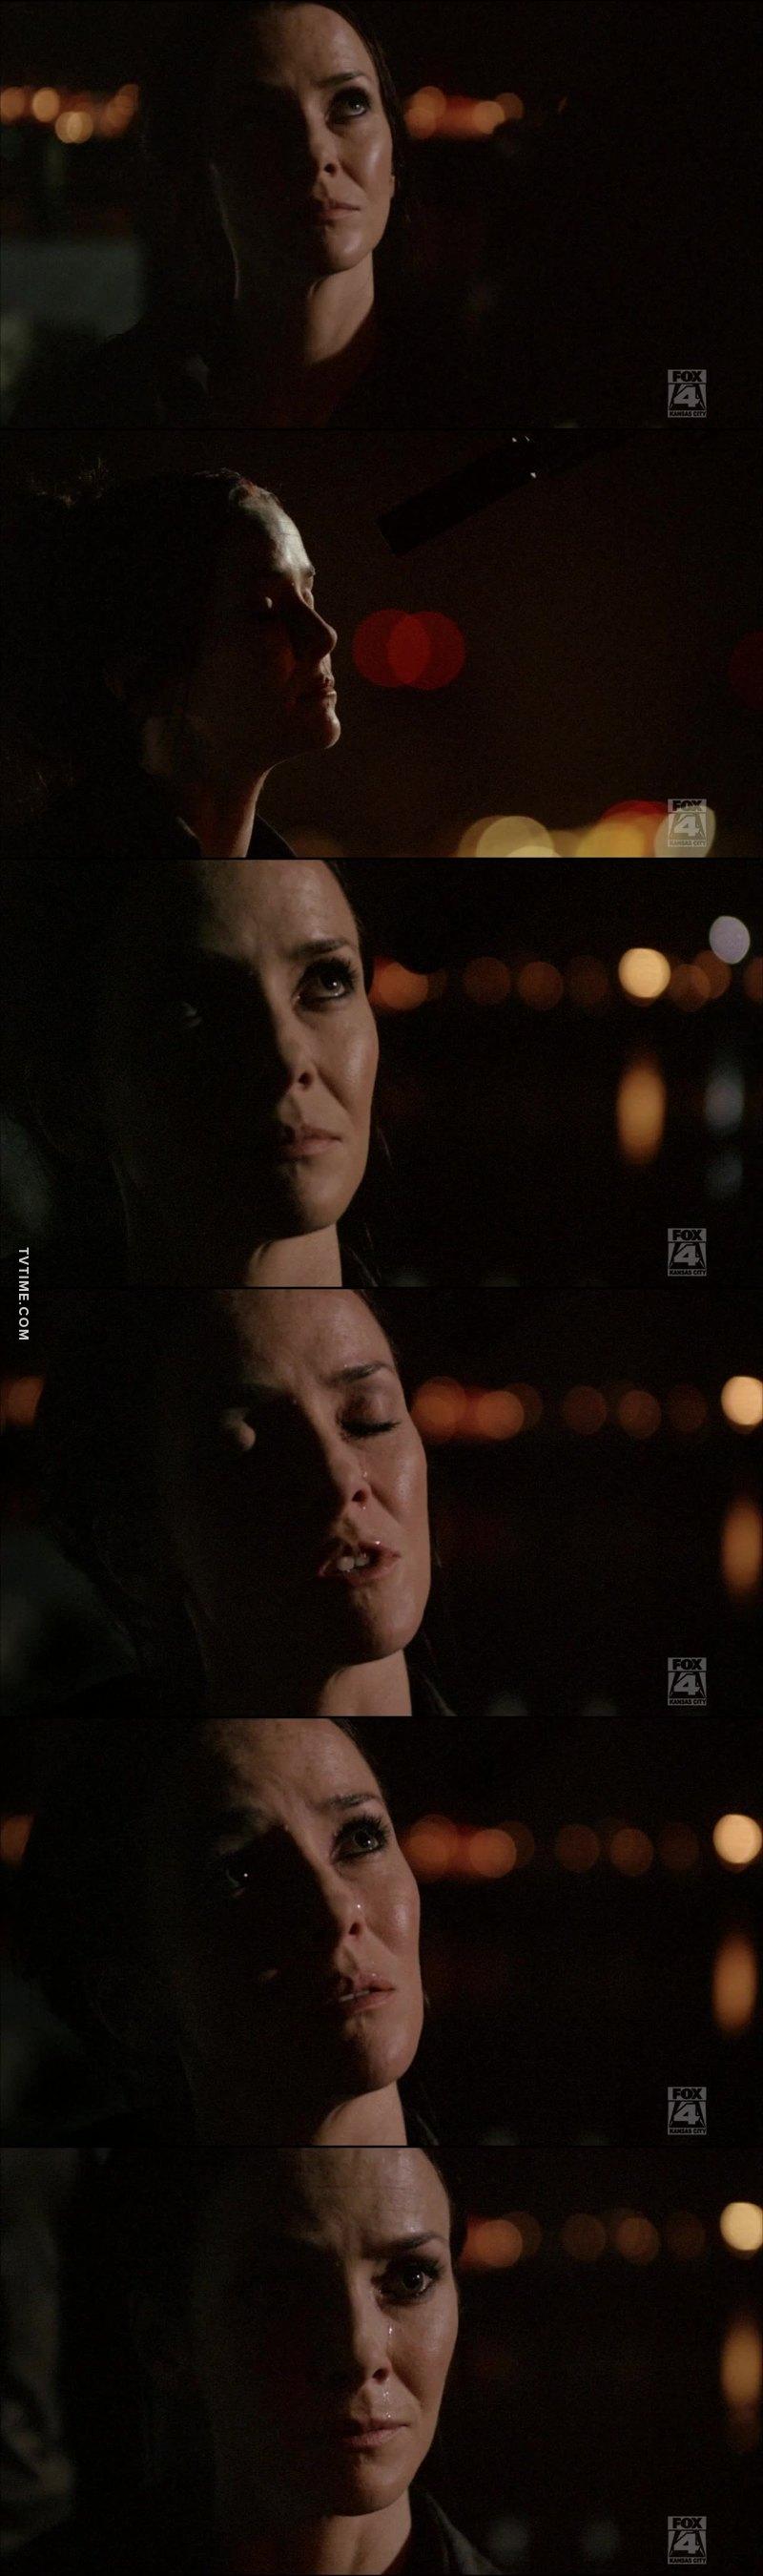 Renee's speech made me so sad 😢😢😢